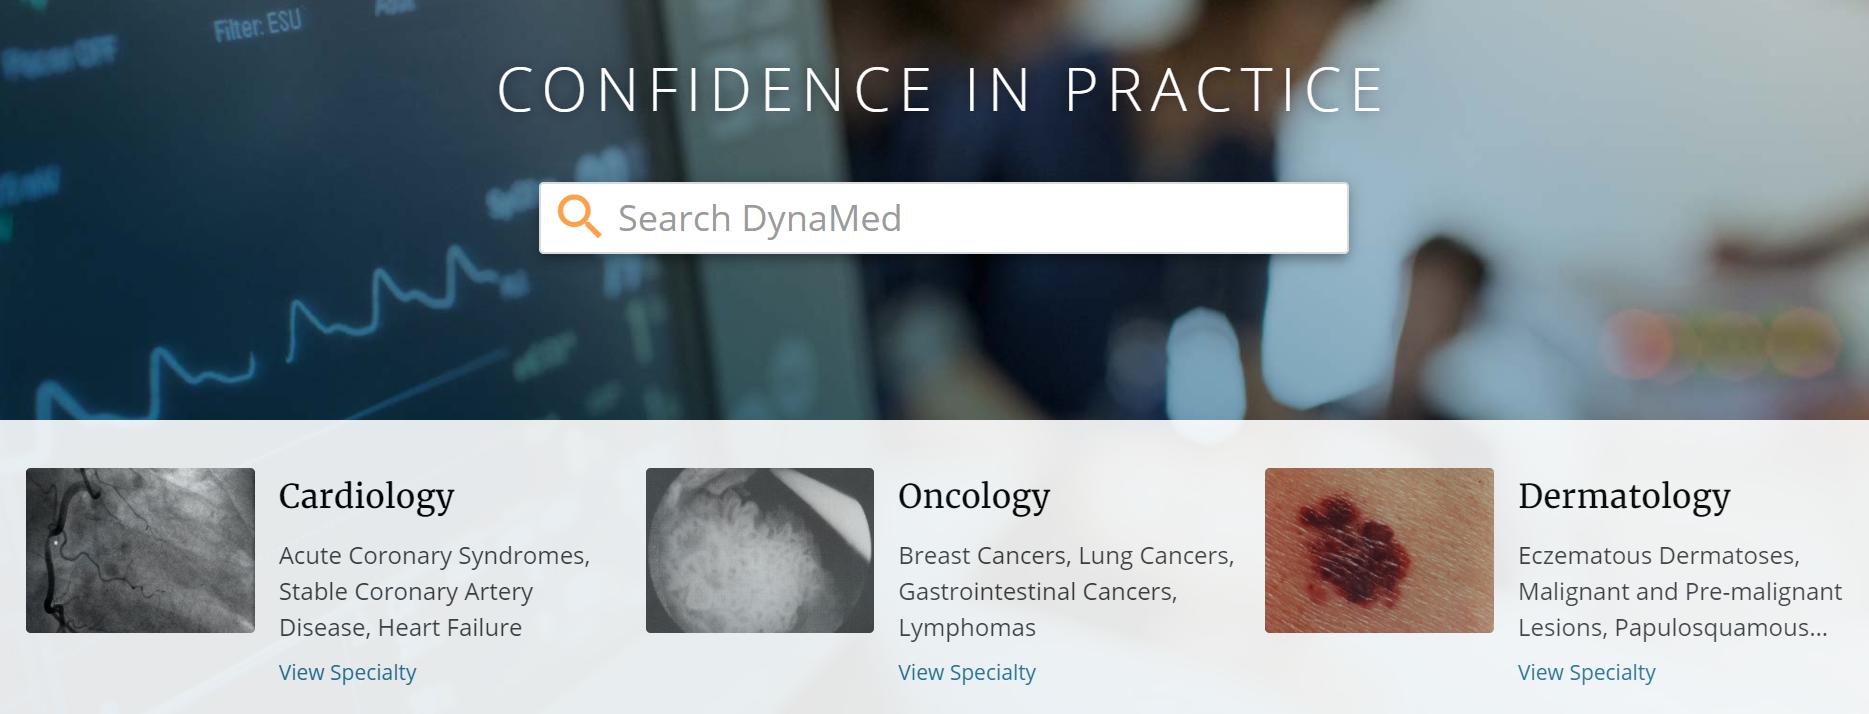 Fine Panel Ofrece Actualización en Medicina basada en evidencias